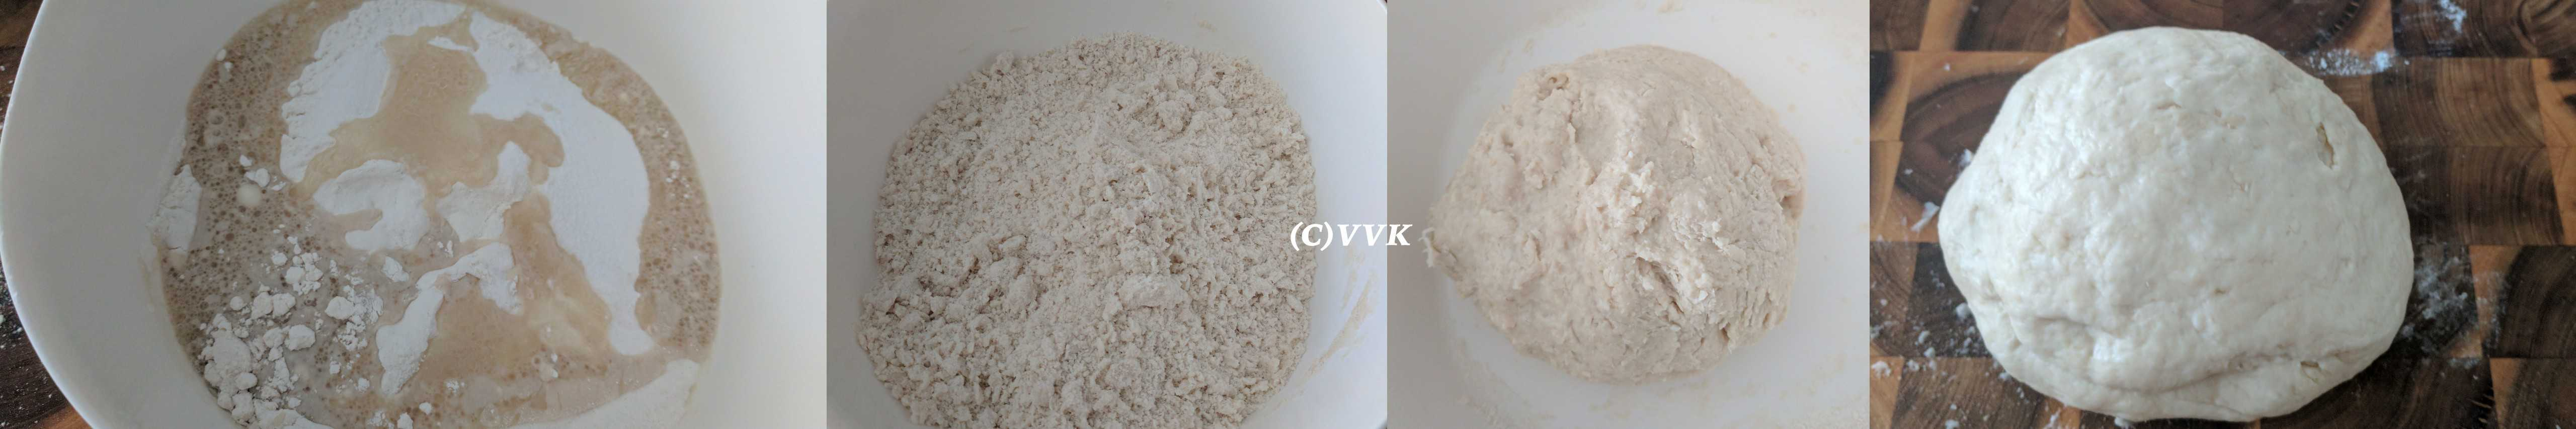 Sieve the flour, sugar, salt in a wide mixing bowl